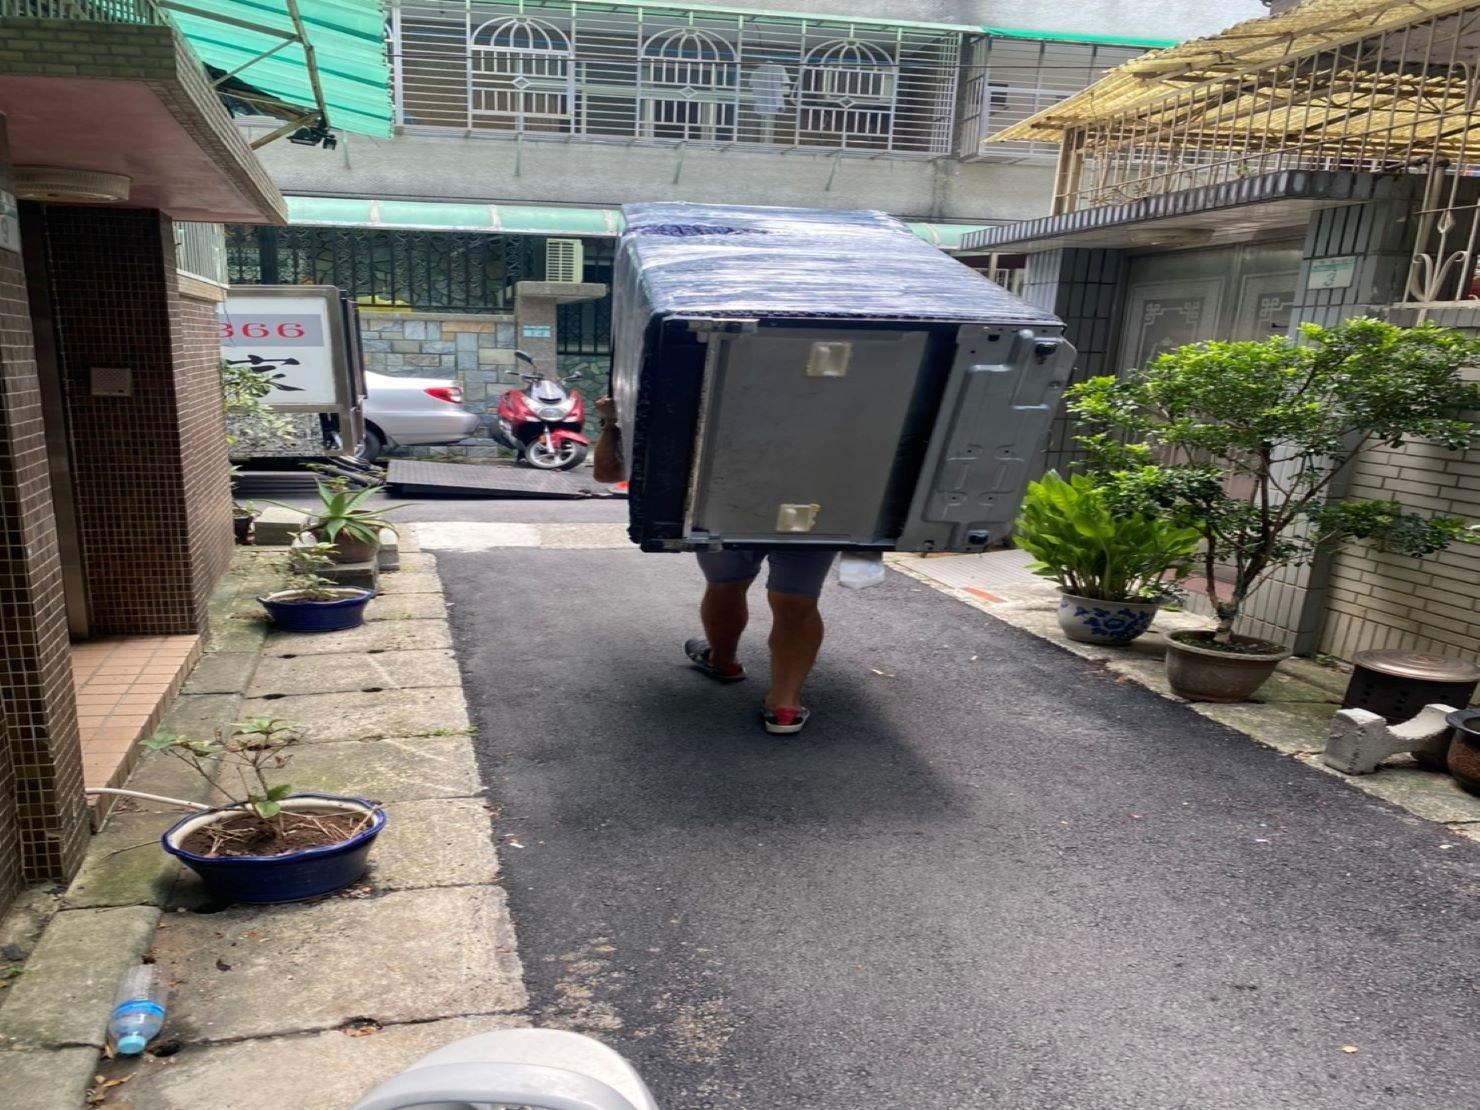 HITACHI大型冰箱搬運下樓-搬家公司推薦【榮福搬家】南港搬家公司,走巷弄需以人力背搬運送至貨車上